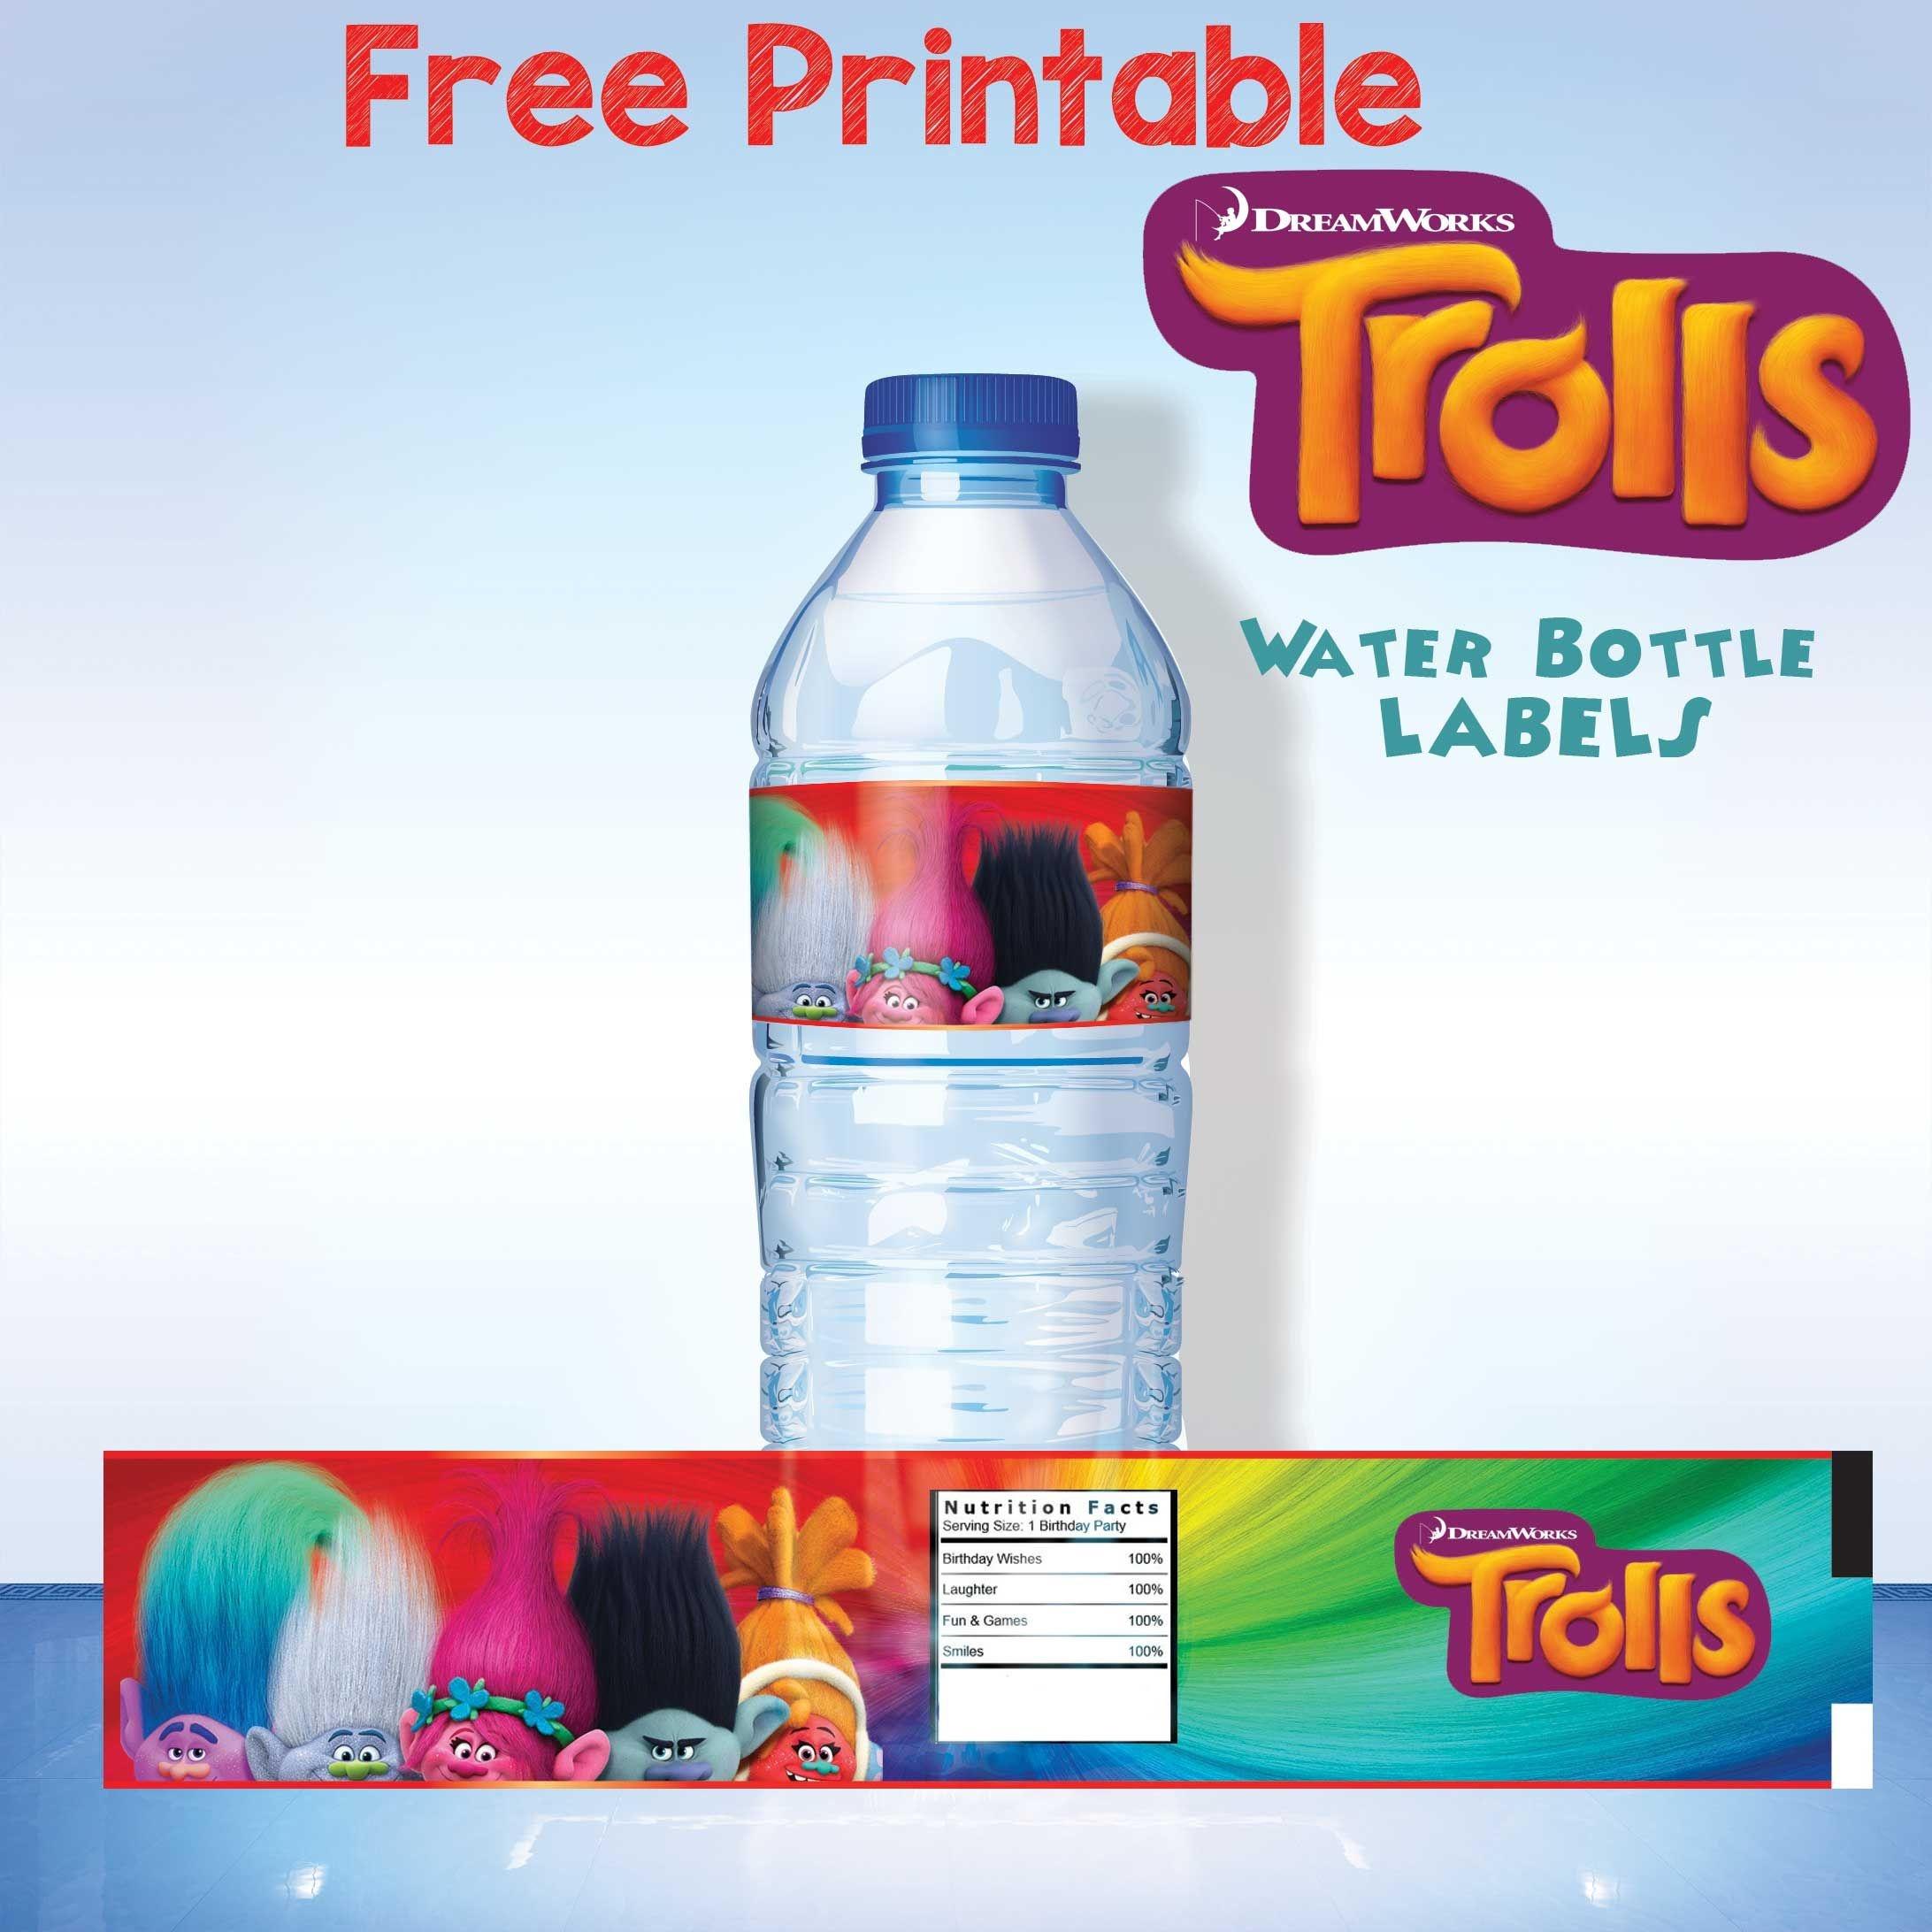 Free Printable Trolls Water Bottle Label | Trolls | Printable Water - Free Printable Water Bottle Labels For Birthday